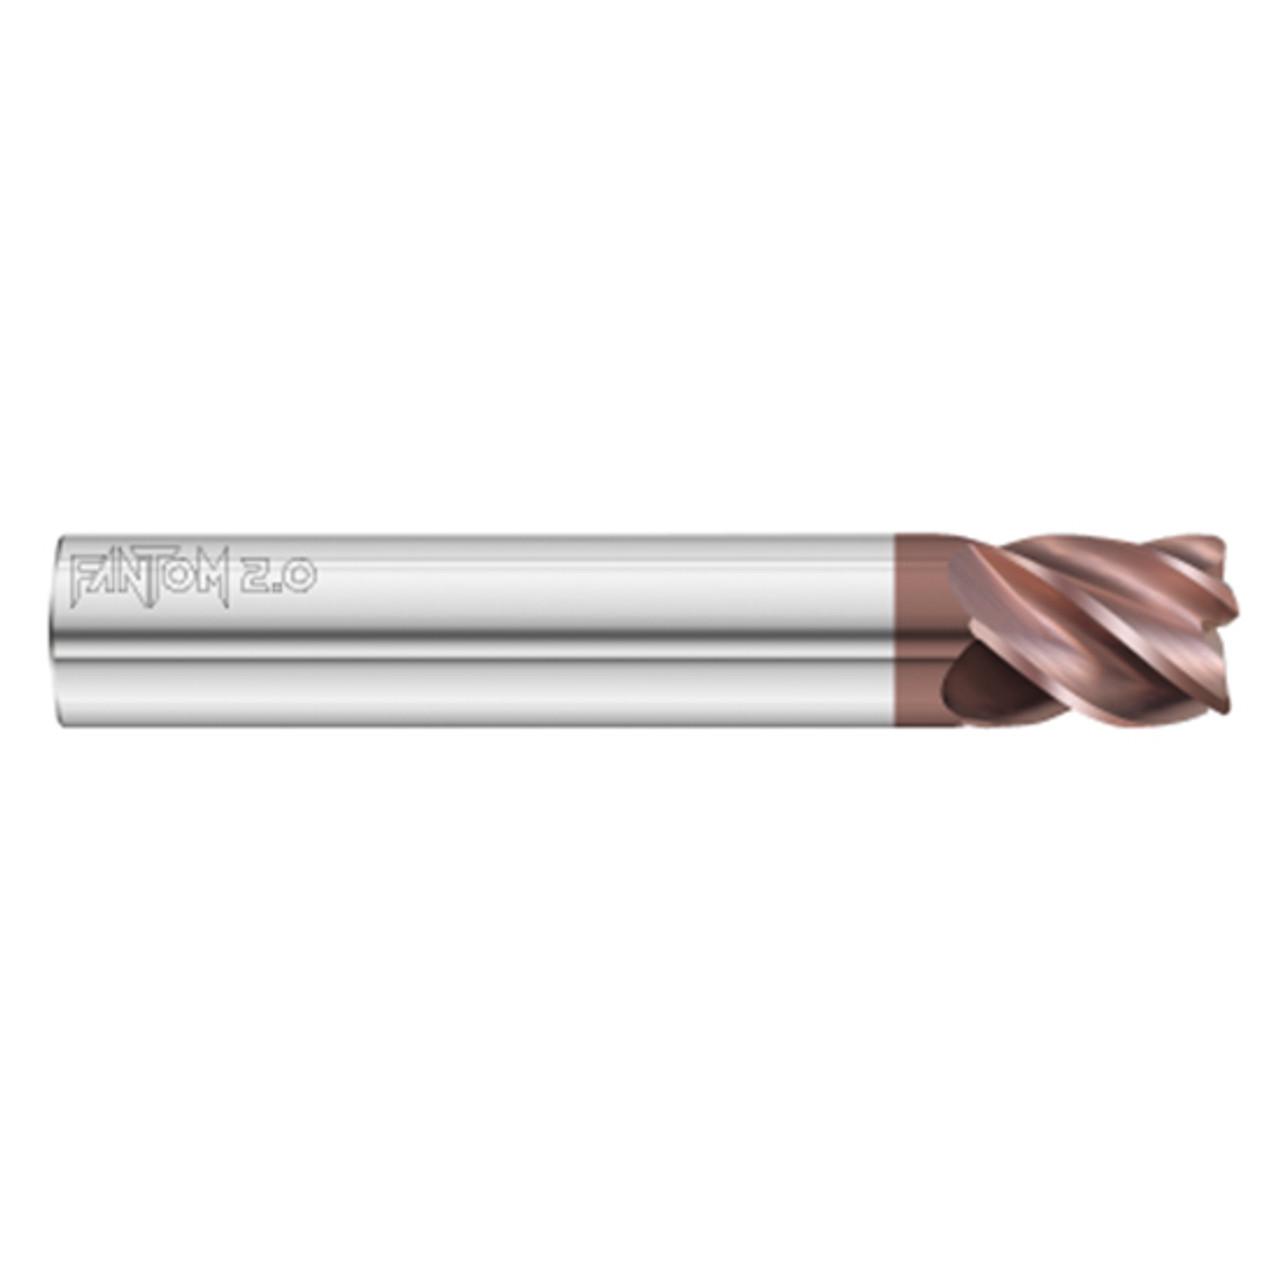 Fullerton Tool 37922 3//4 Diameter x 3//4 Shank x 1 LOC x 6 OAL 5 Flute FC20 Solid Carbide Radius End Mill